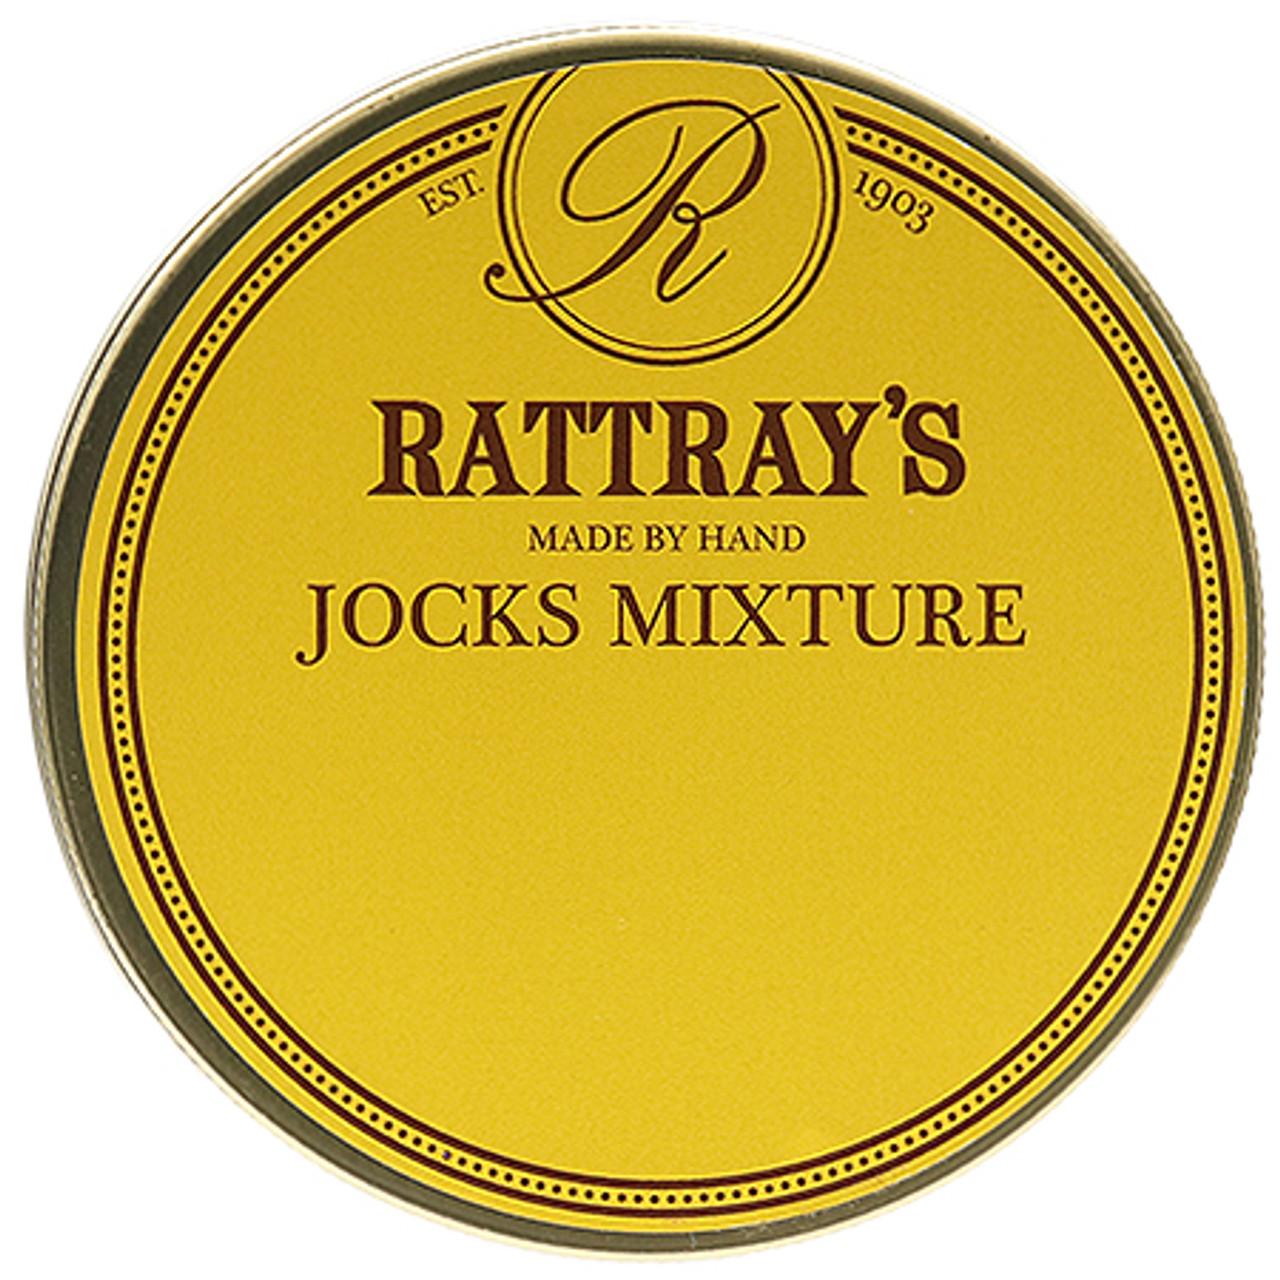 Rattray's Jocks Mixture Pipe Tobacco   1.75 OZ TIN